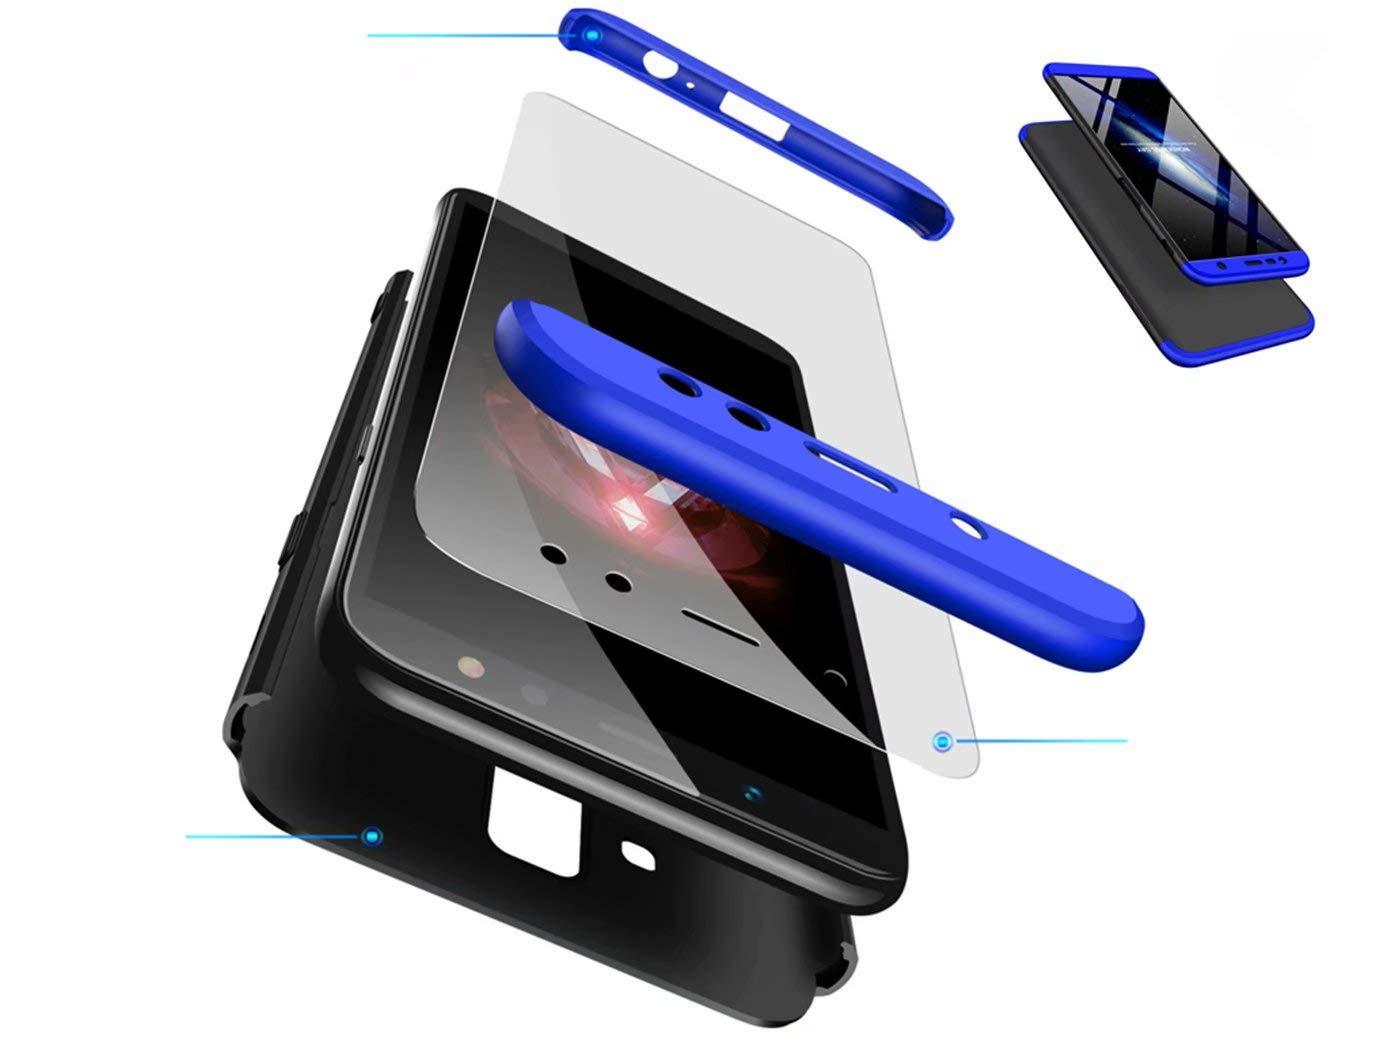 DYGG Huawei P smart 2019 /名誉10 Liteケース用ケース、カバープラスチック製の転倒防止用保護[強化ガラス製スクリーンプロテクター]、ブラックブルー   B07NJQNXPM